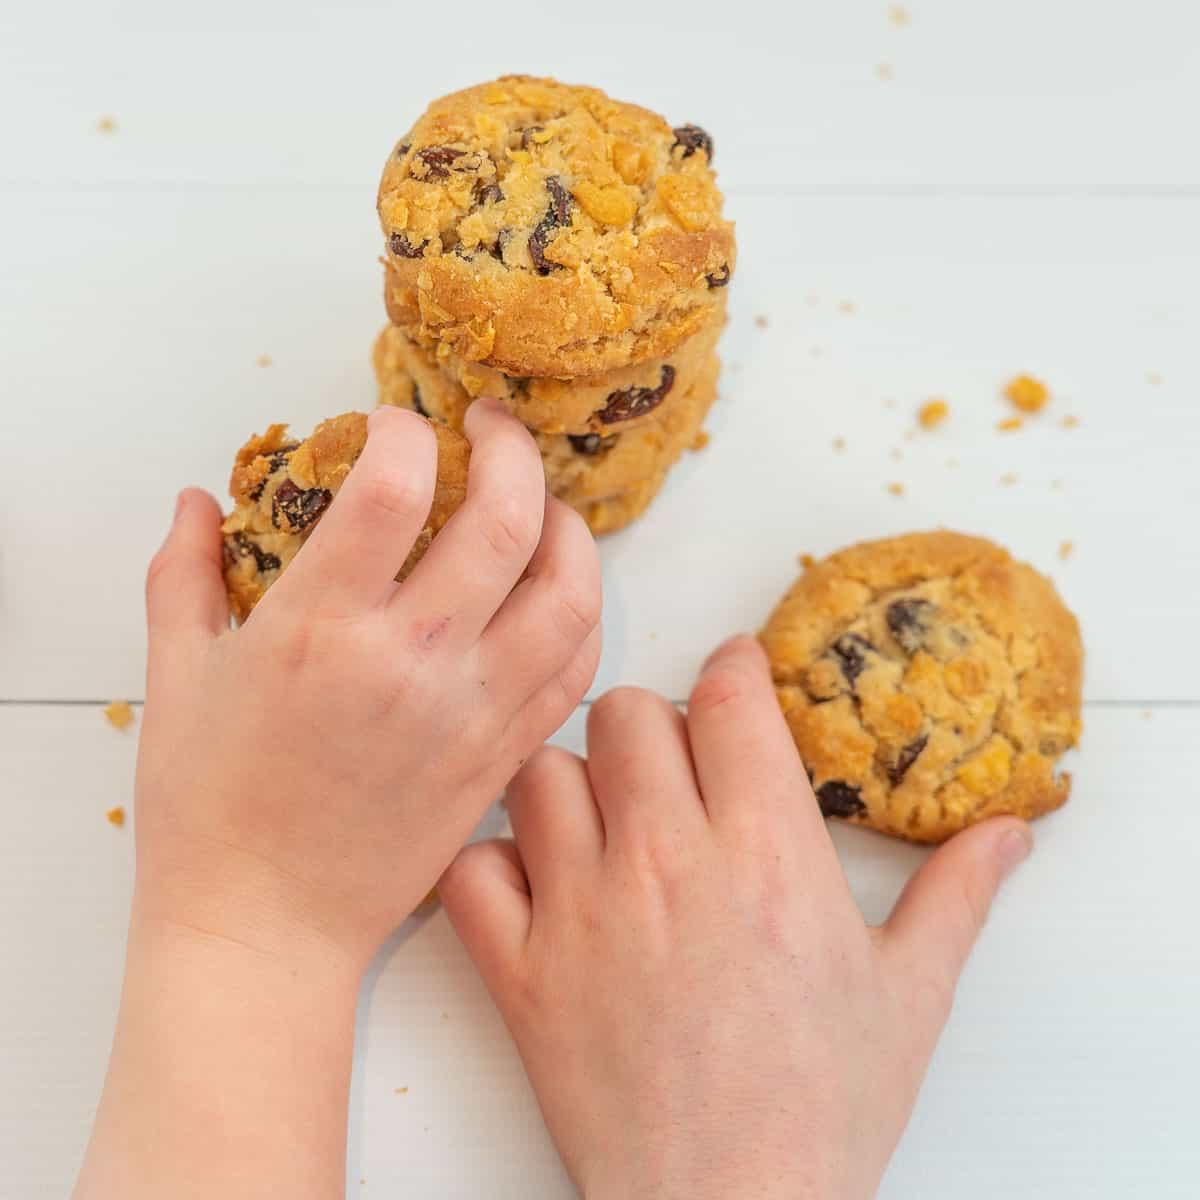 2 children's hands reaching for cornflake and raisin cookies